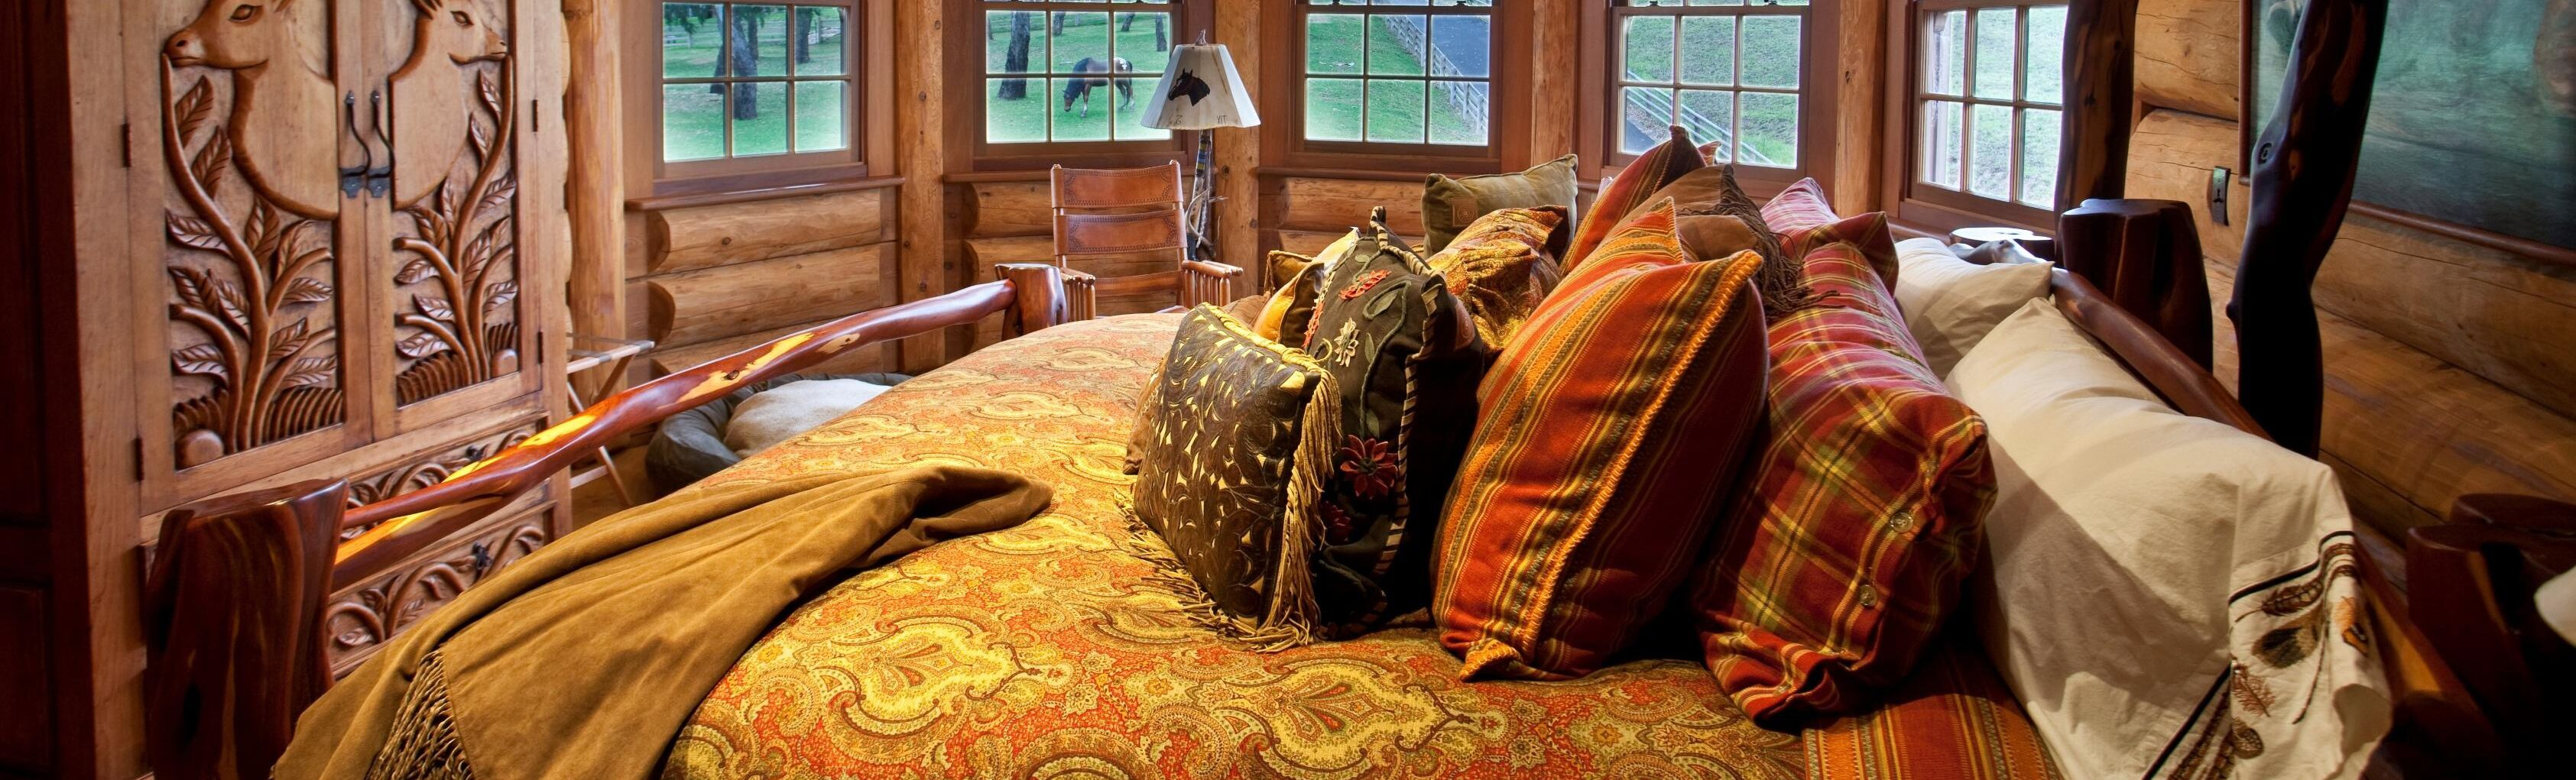 Weifang mingze international trade co., ltd.   bedding set,textile ...